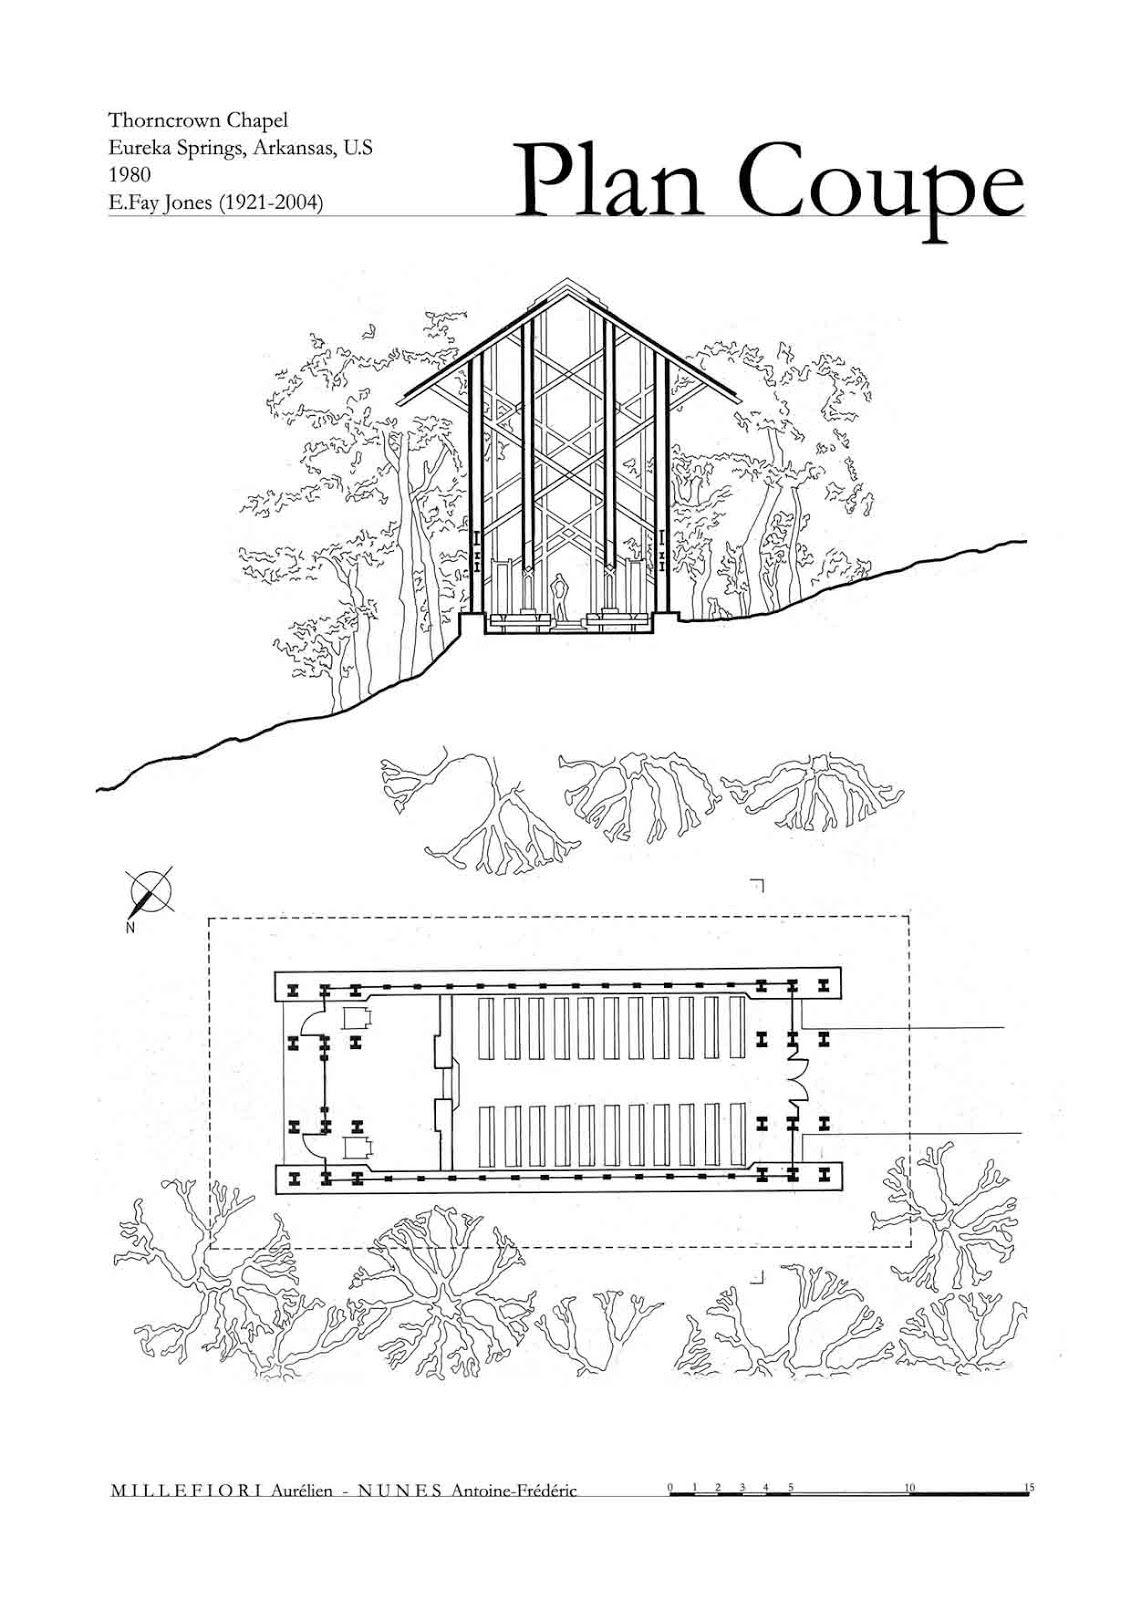 Image Result For Thorncrown Chapel Architectural Drawings Thorncrown Chapel Chapel Thorncrown Chapel Eureka Springs